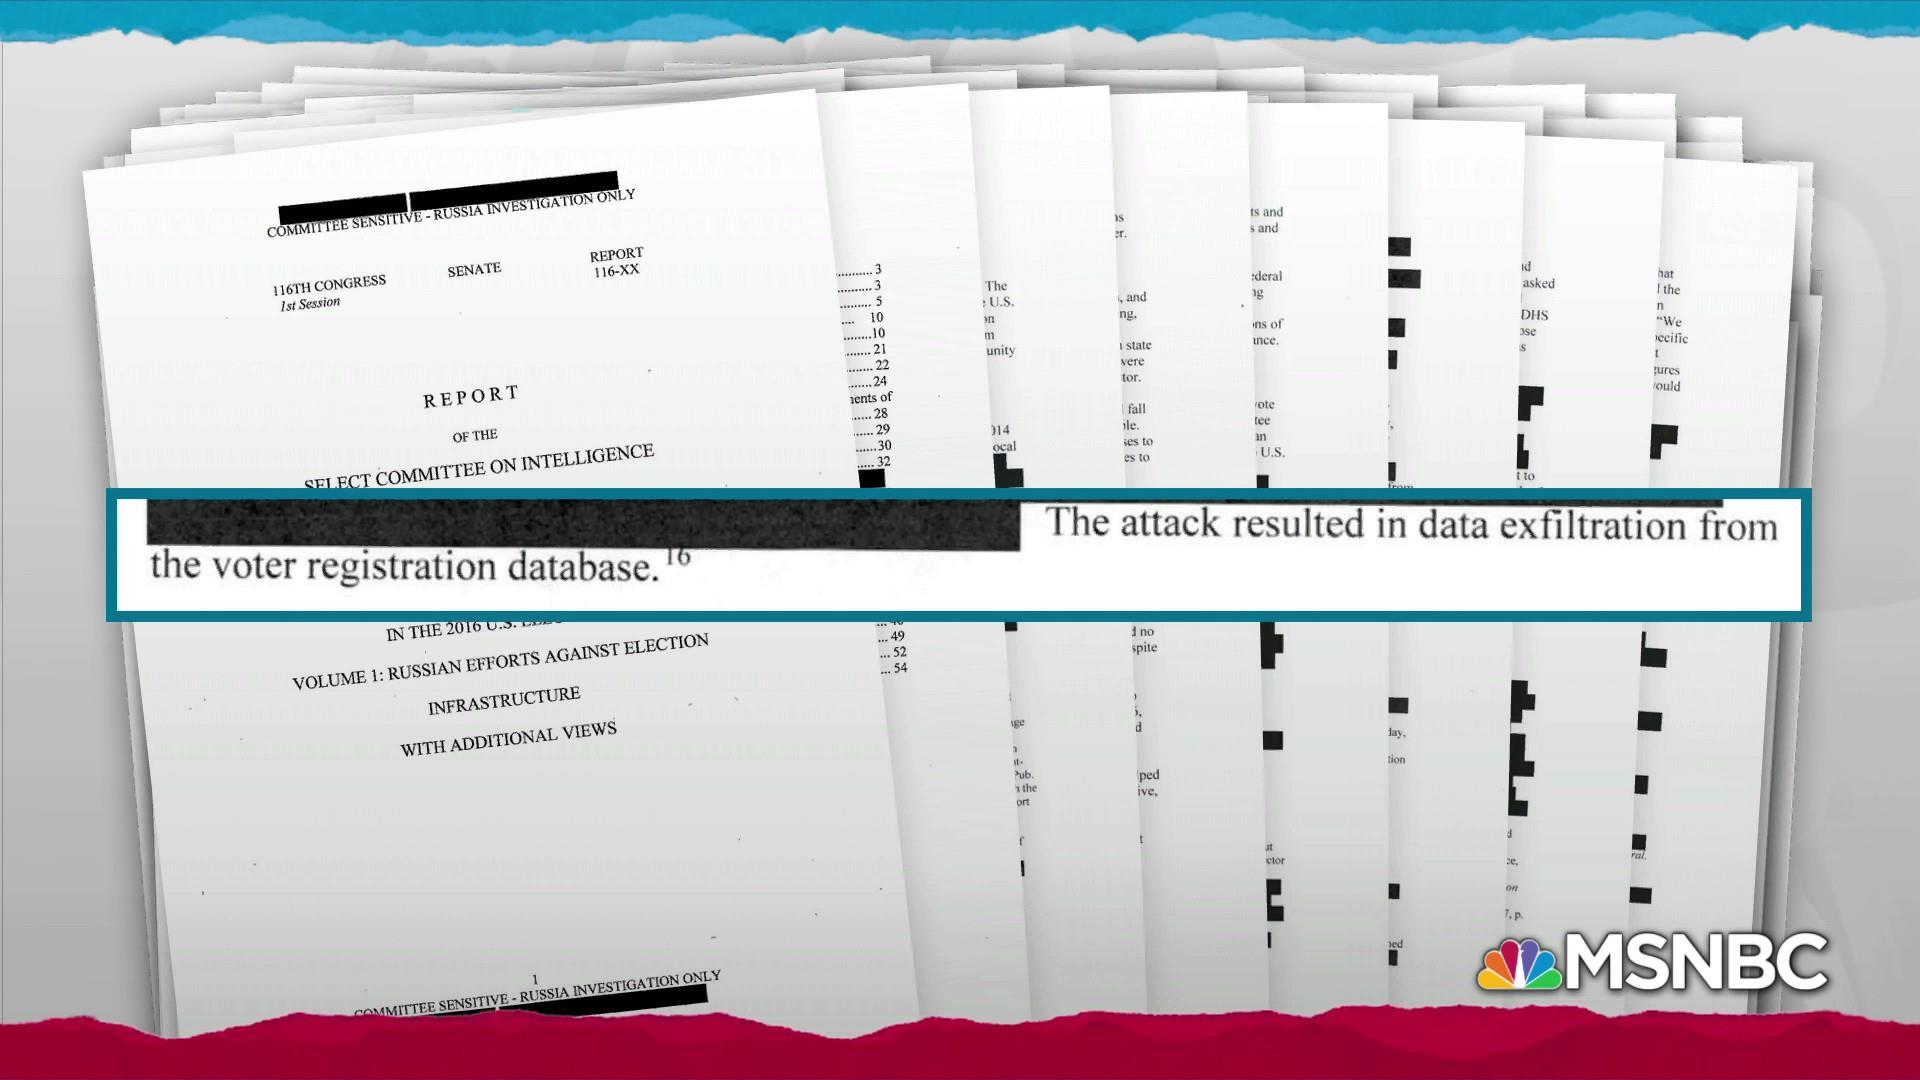 Russian hackers accessed U.S. voter data: Senate report